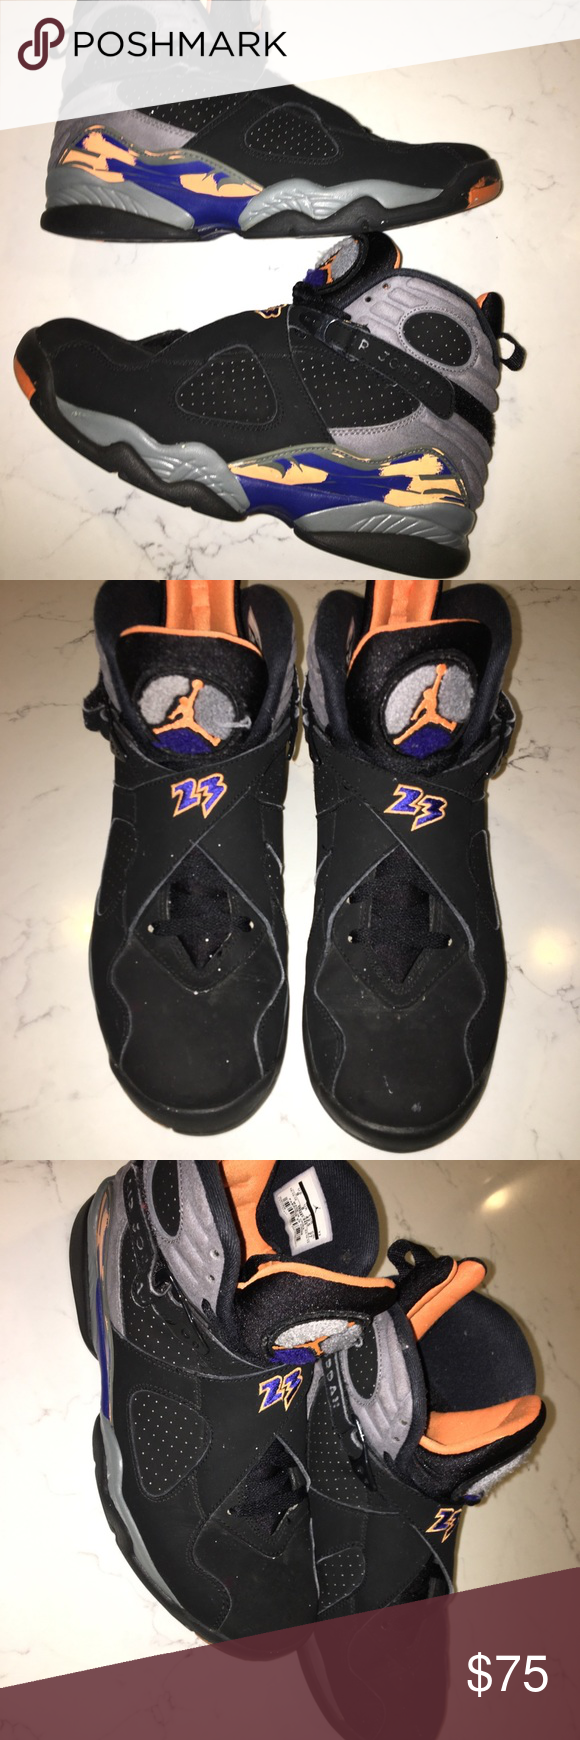 best authentic 1b88c 93fe1 Jordan 8 Retro Phoenix Suns- Size 9 Nike Jordan 8s Colorway  BLACK BRIGHT  CITRUS-COOL GREY-DEEP ROYAL BLUE RETAIL PRICE  160 RELEASE DATE 2013-05-18  No box.